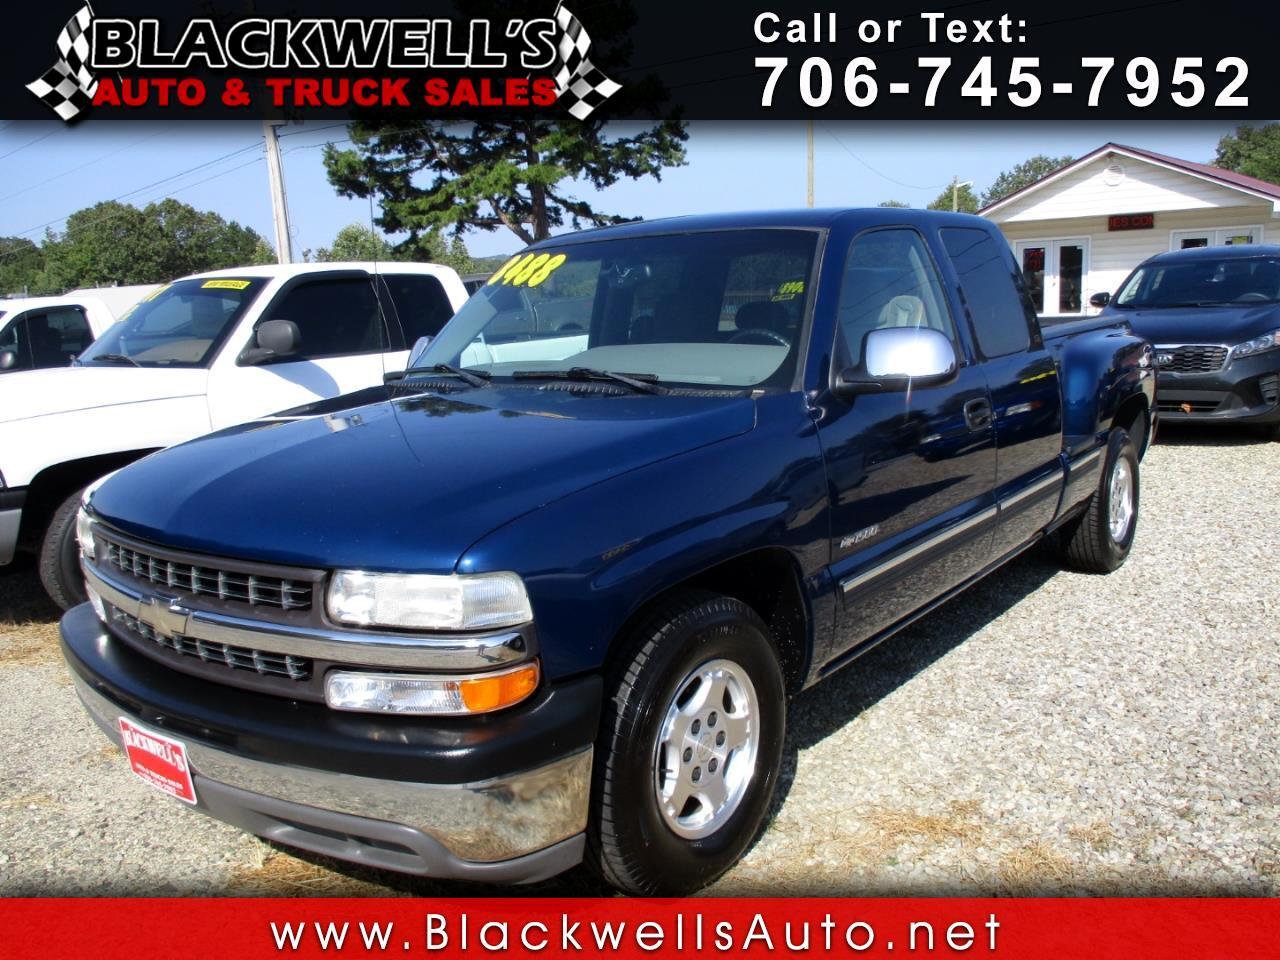 2000 Chevrolet Silverado 1500 3dr Ext Cab 143.5